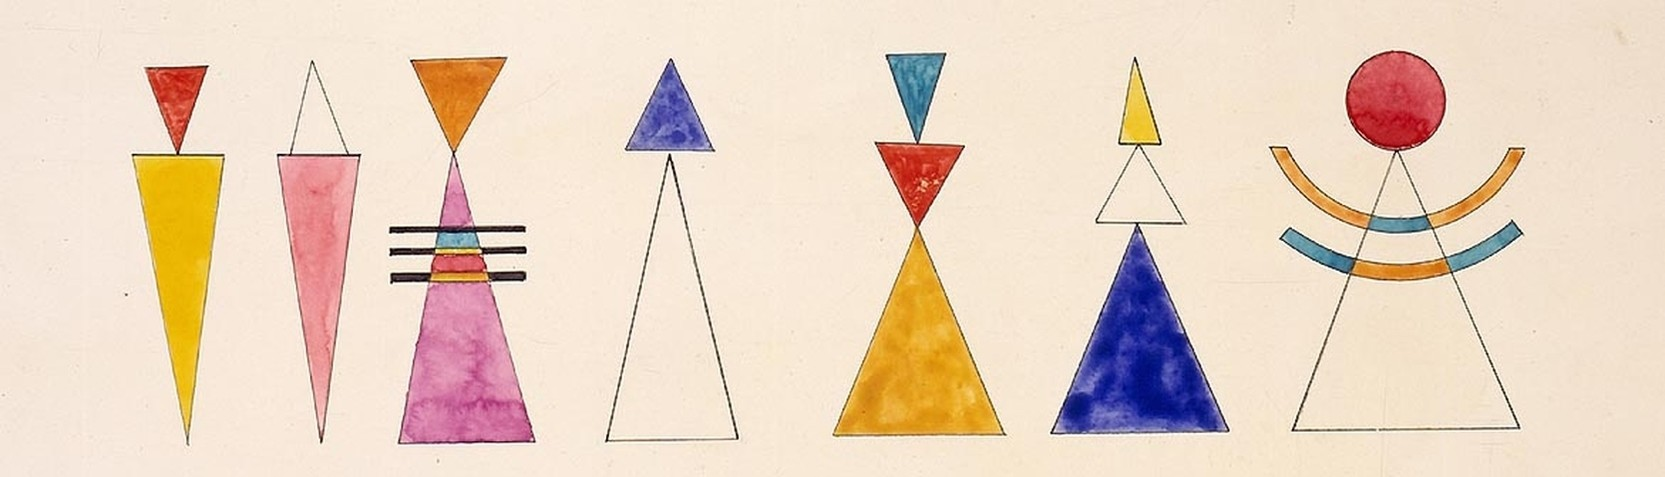 Artistes - Wassily Kandinsky